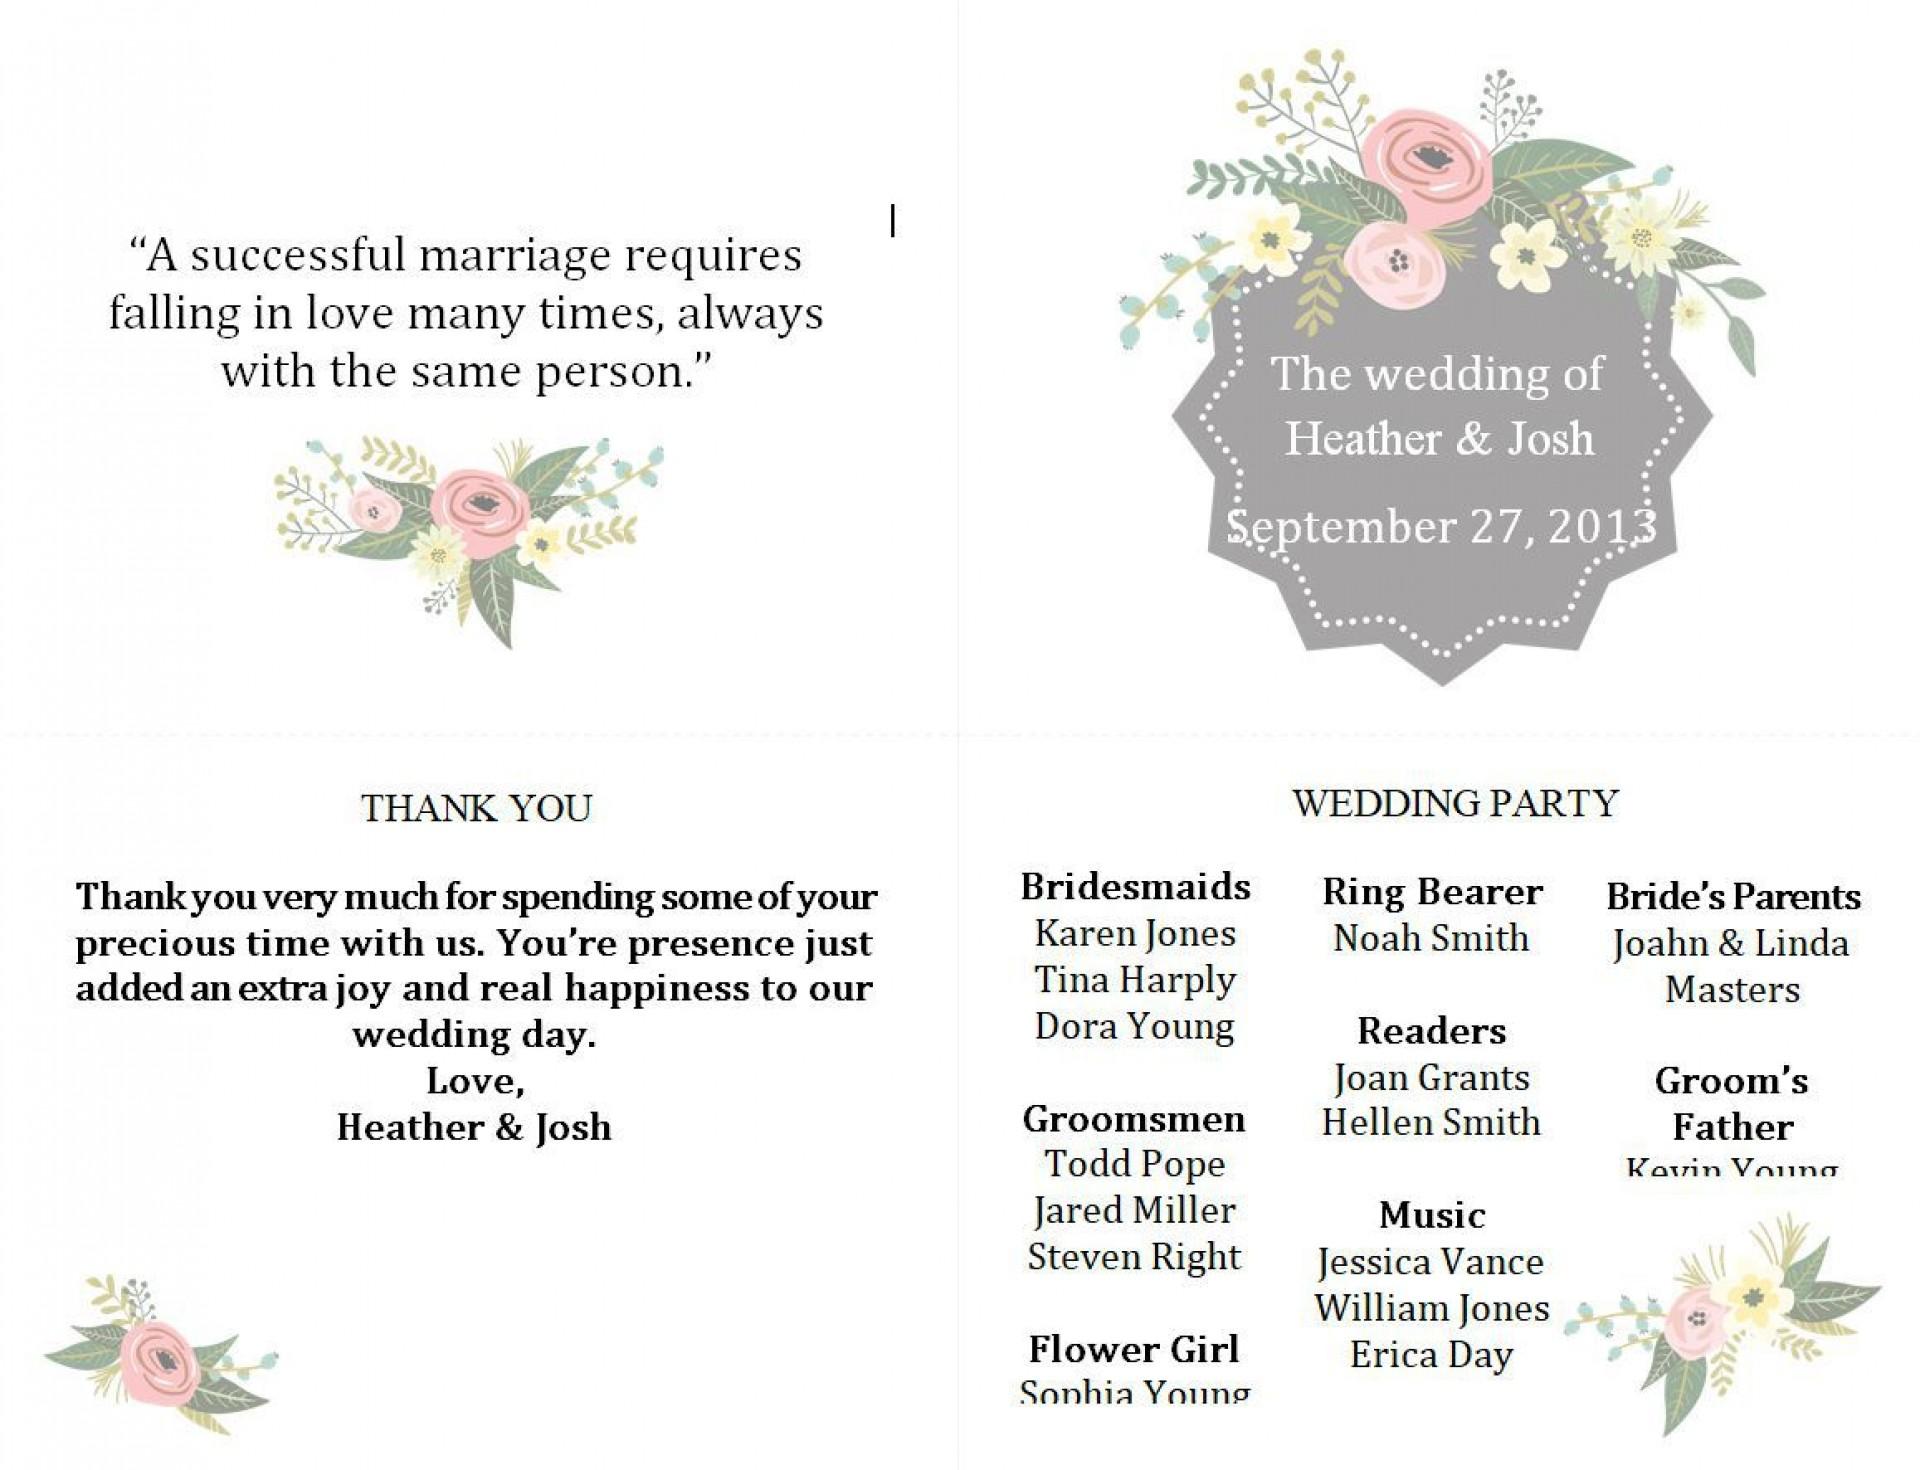 003 Beautiful Wedding Program Template Free Photo  Fan Download Elegant1920